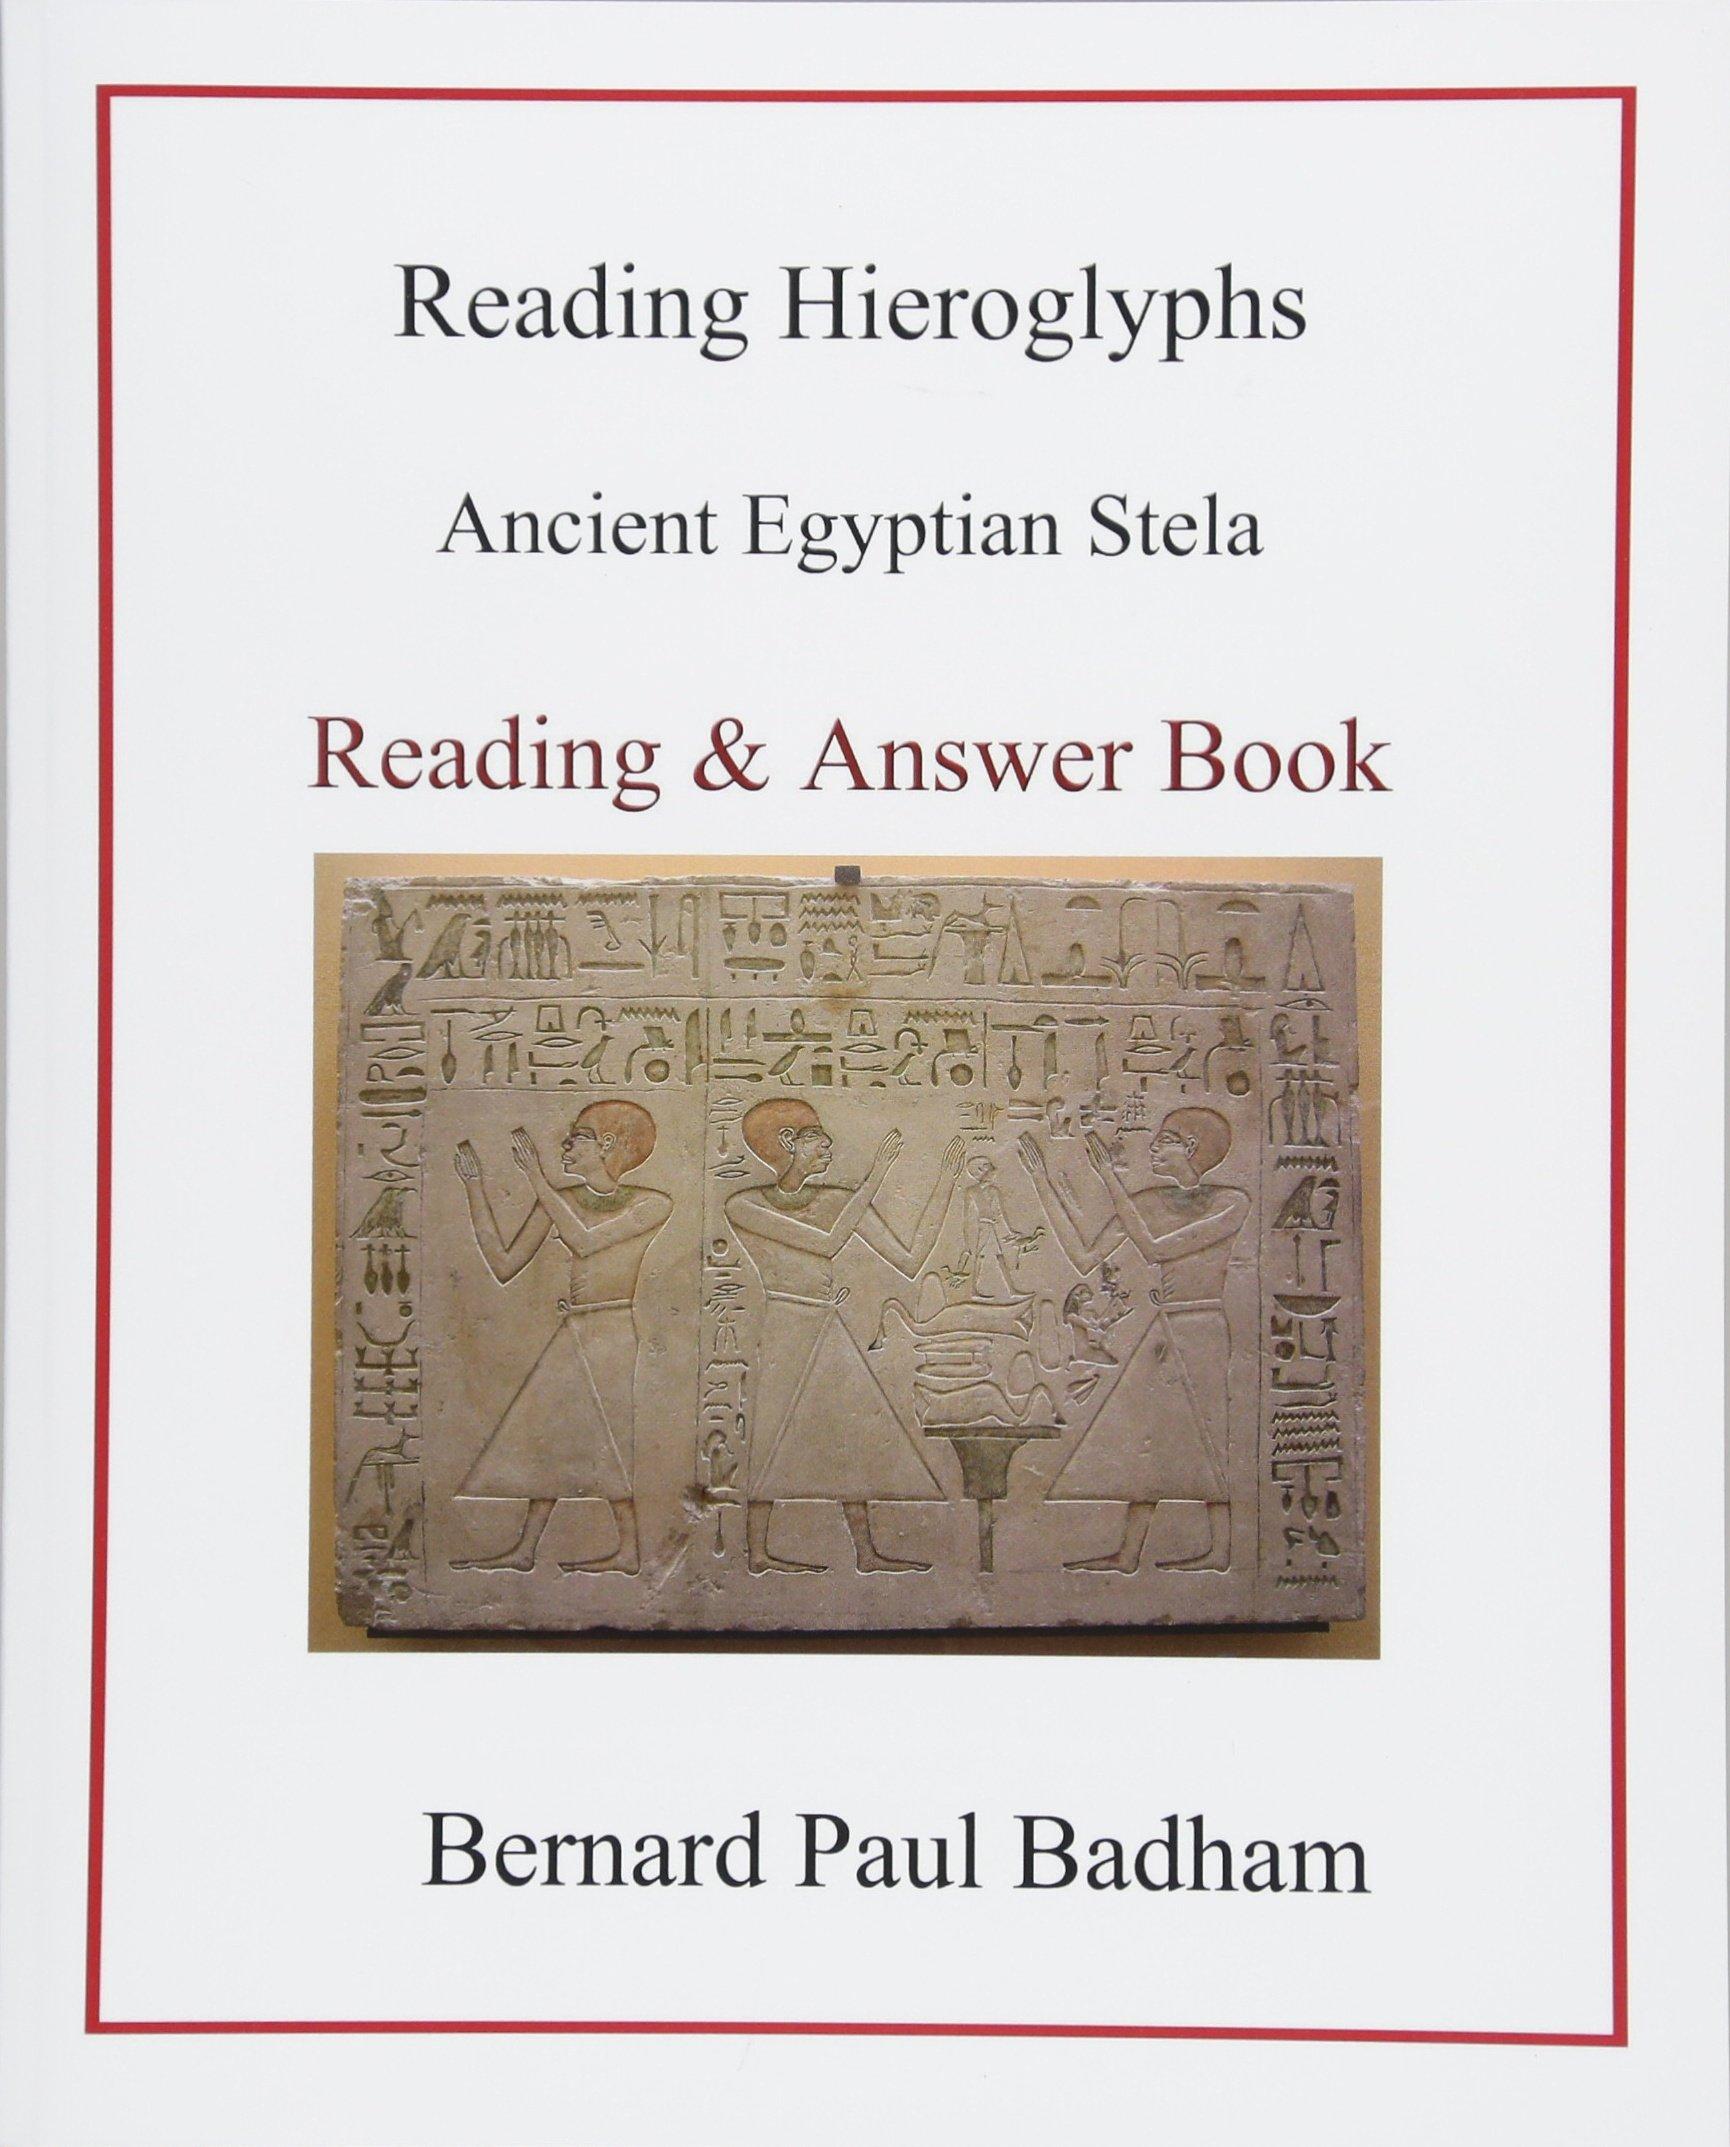 Reading Hieroglyphs - Ancient Egyptian Stela: Reading & Answer Book